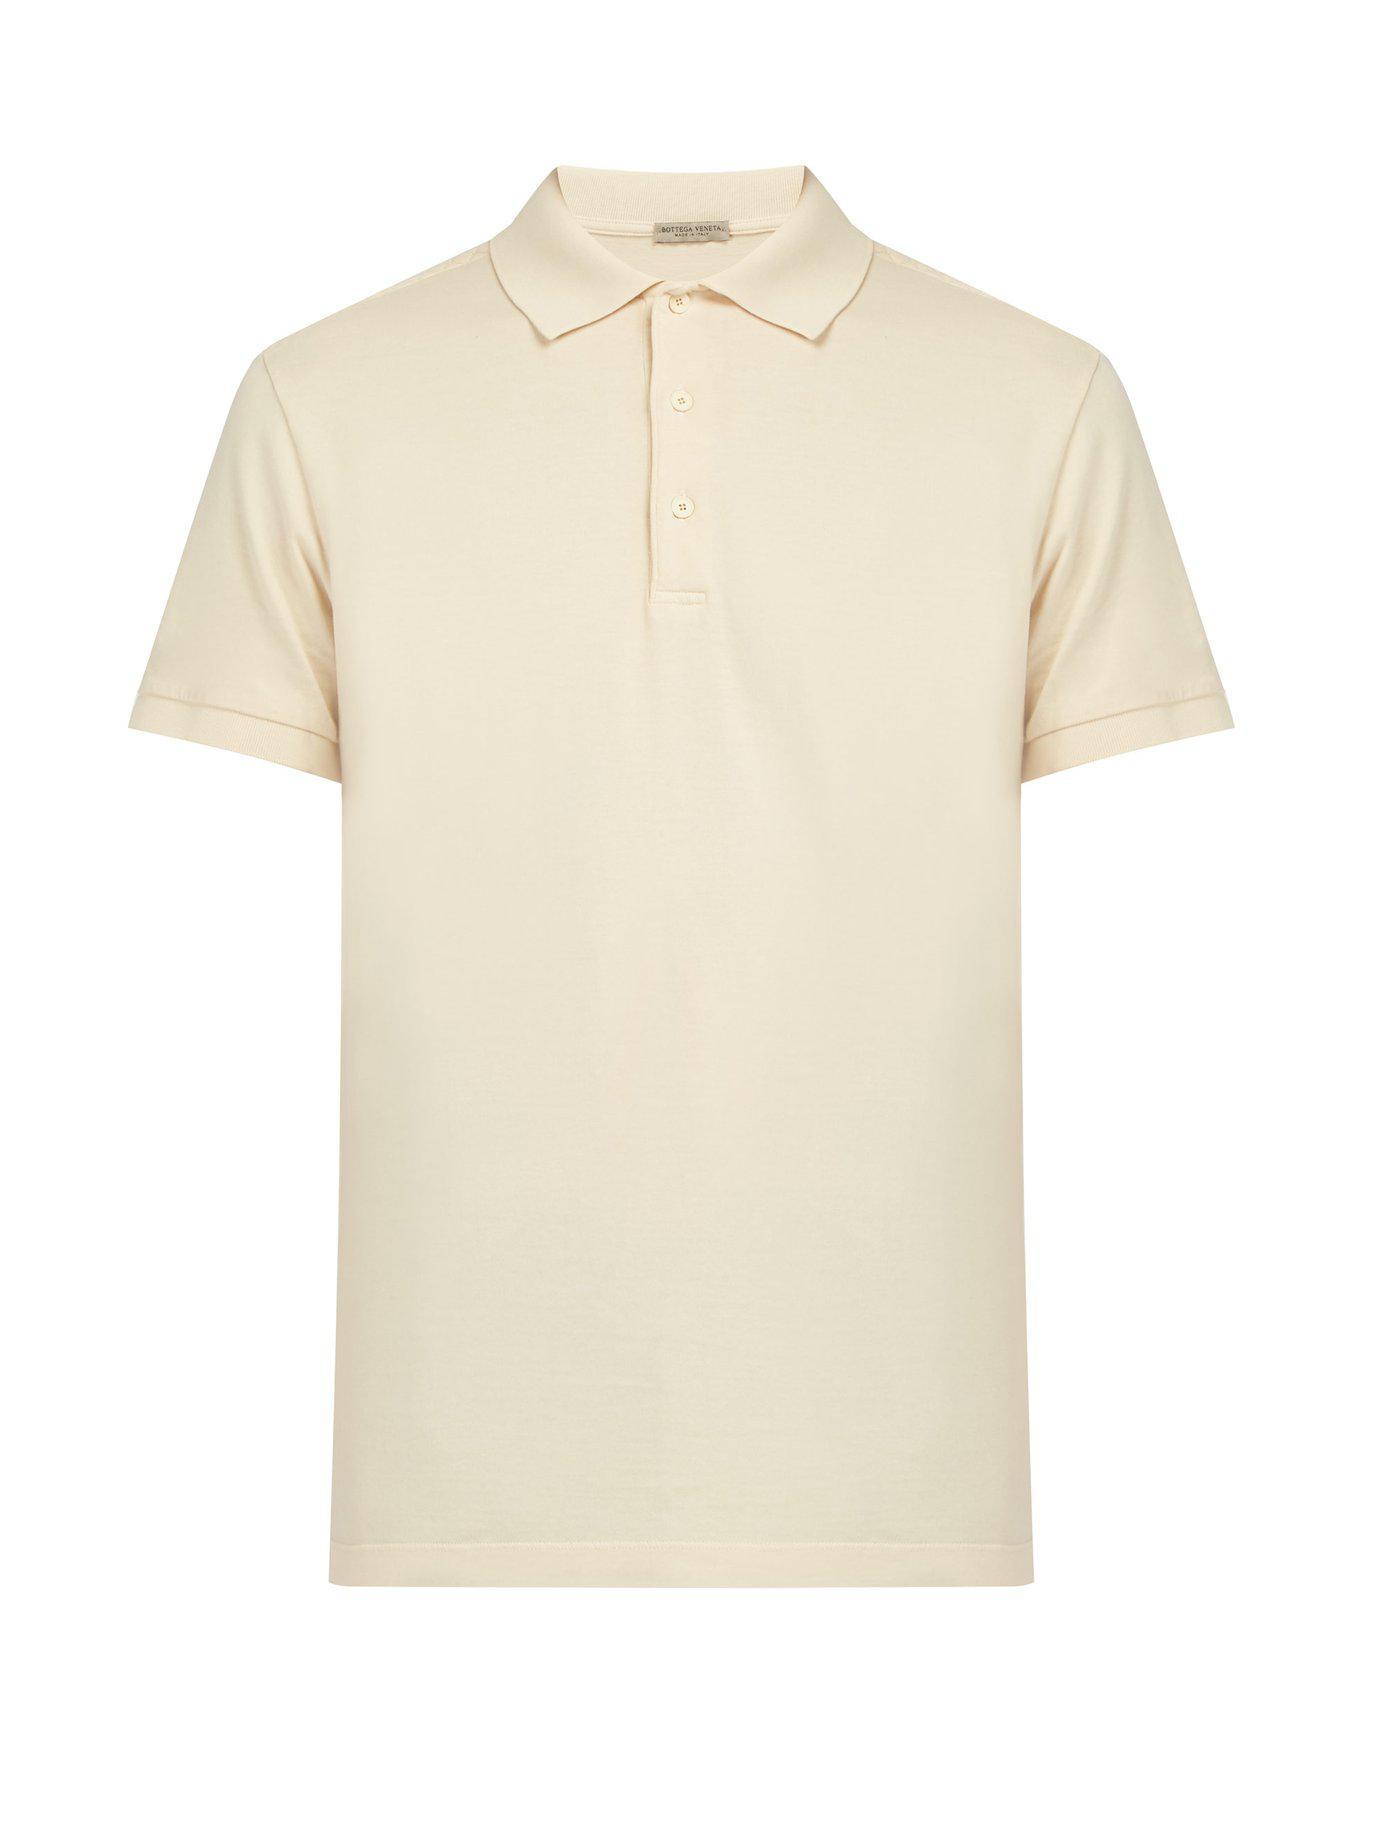 e700532fee Lyst - Bottega Veneta Intrecciato Cotton Polo Shirt in Natural for Men